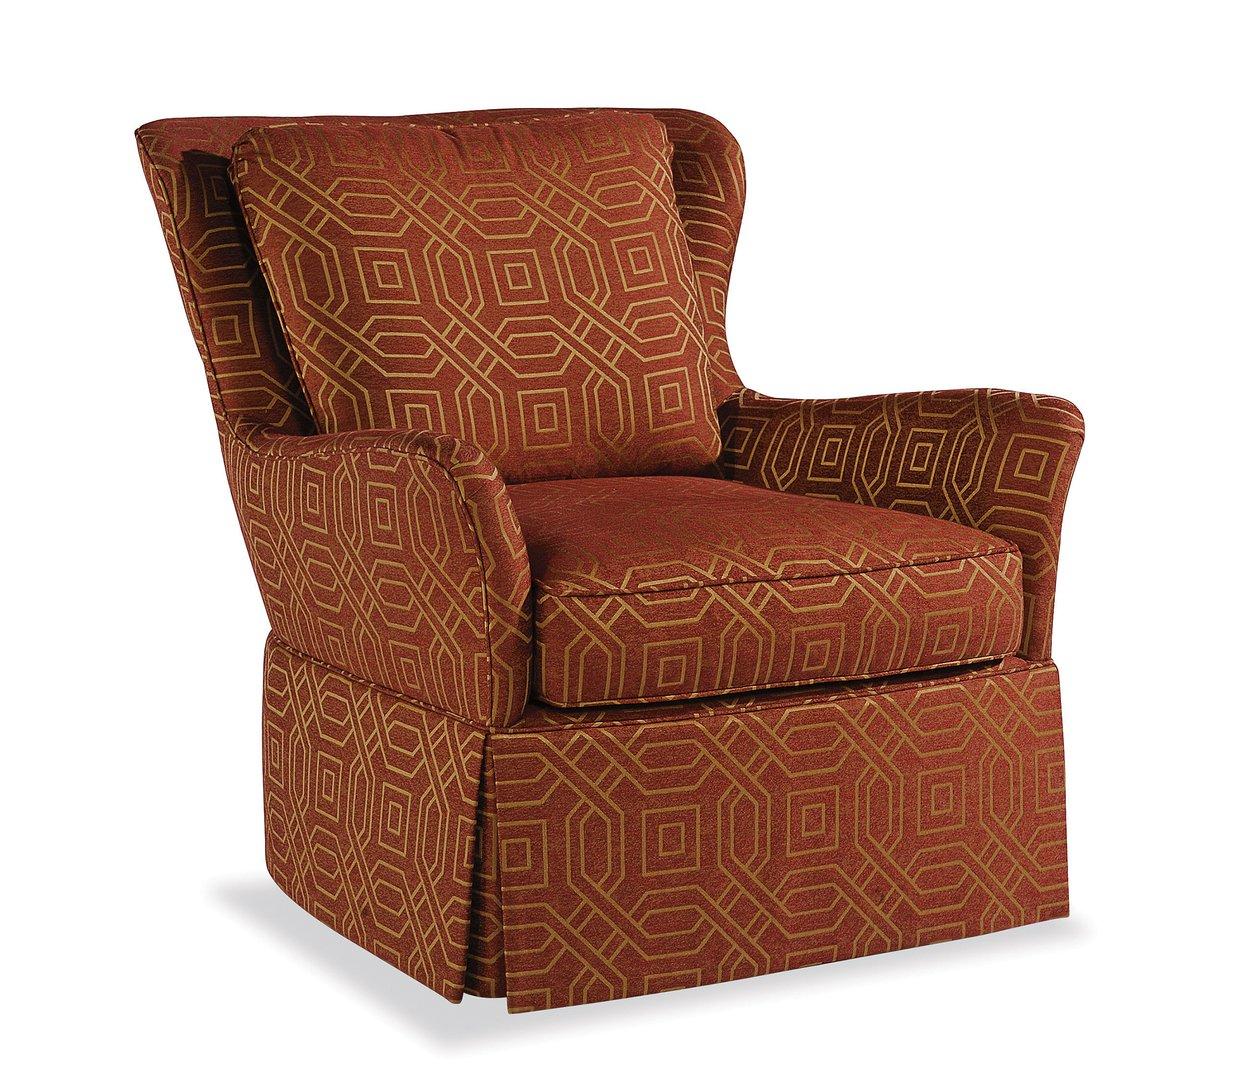 Declan Swivel Chair Image